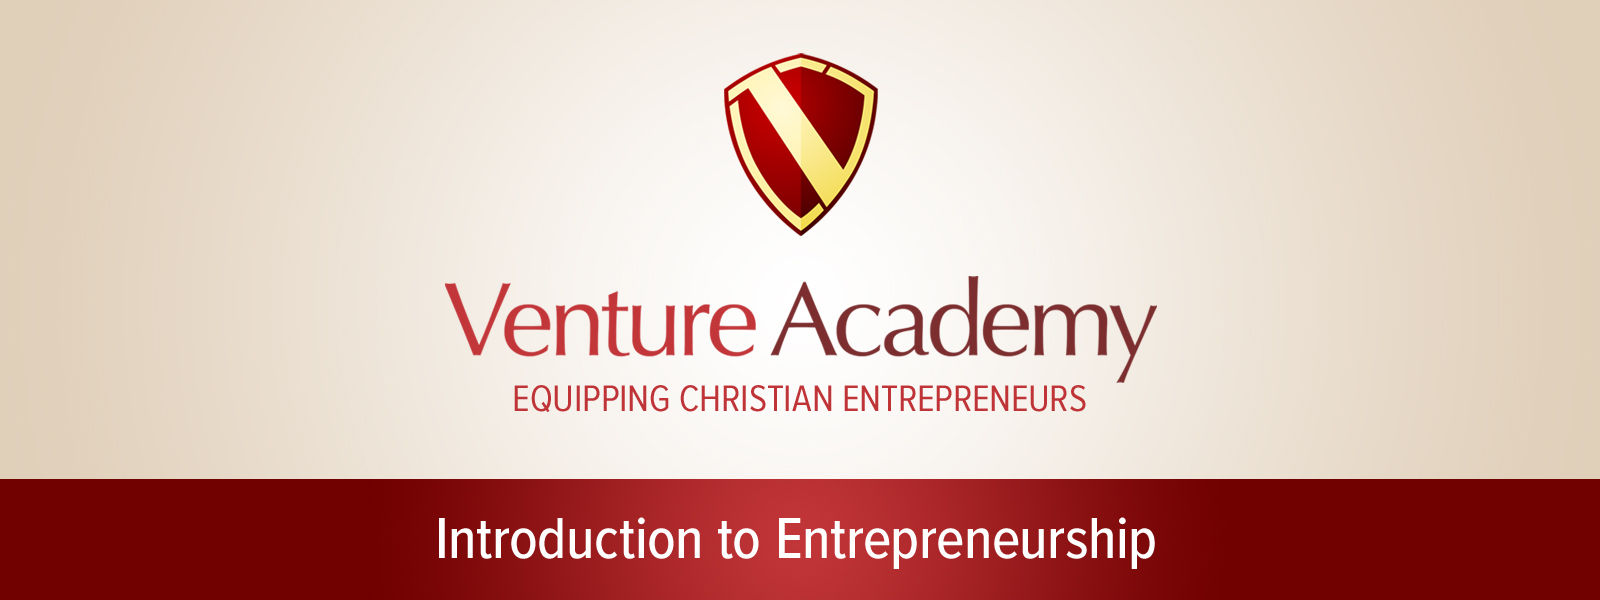 1) Introduction to Entrepreneurship